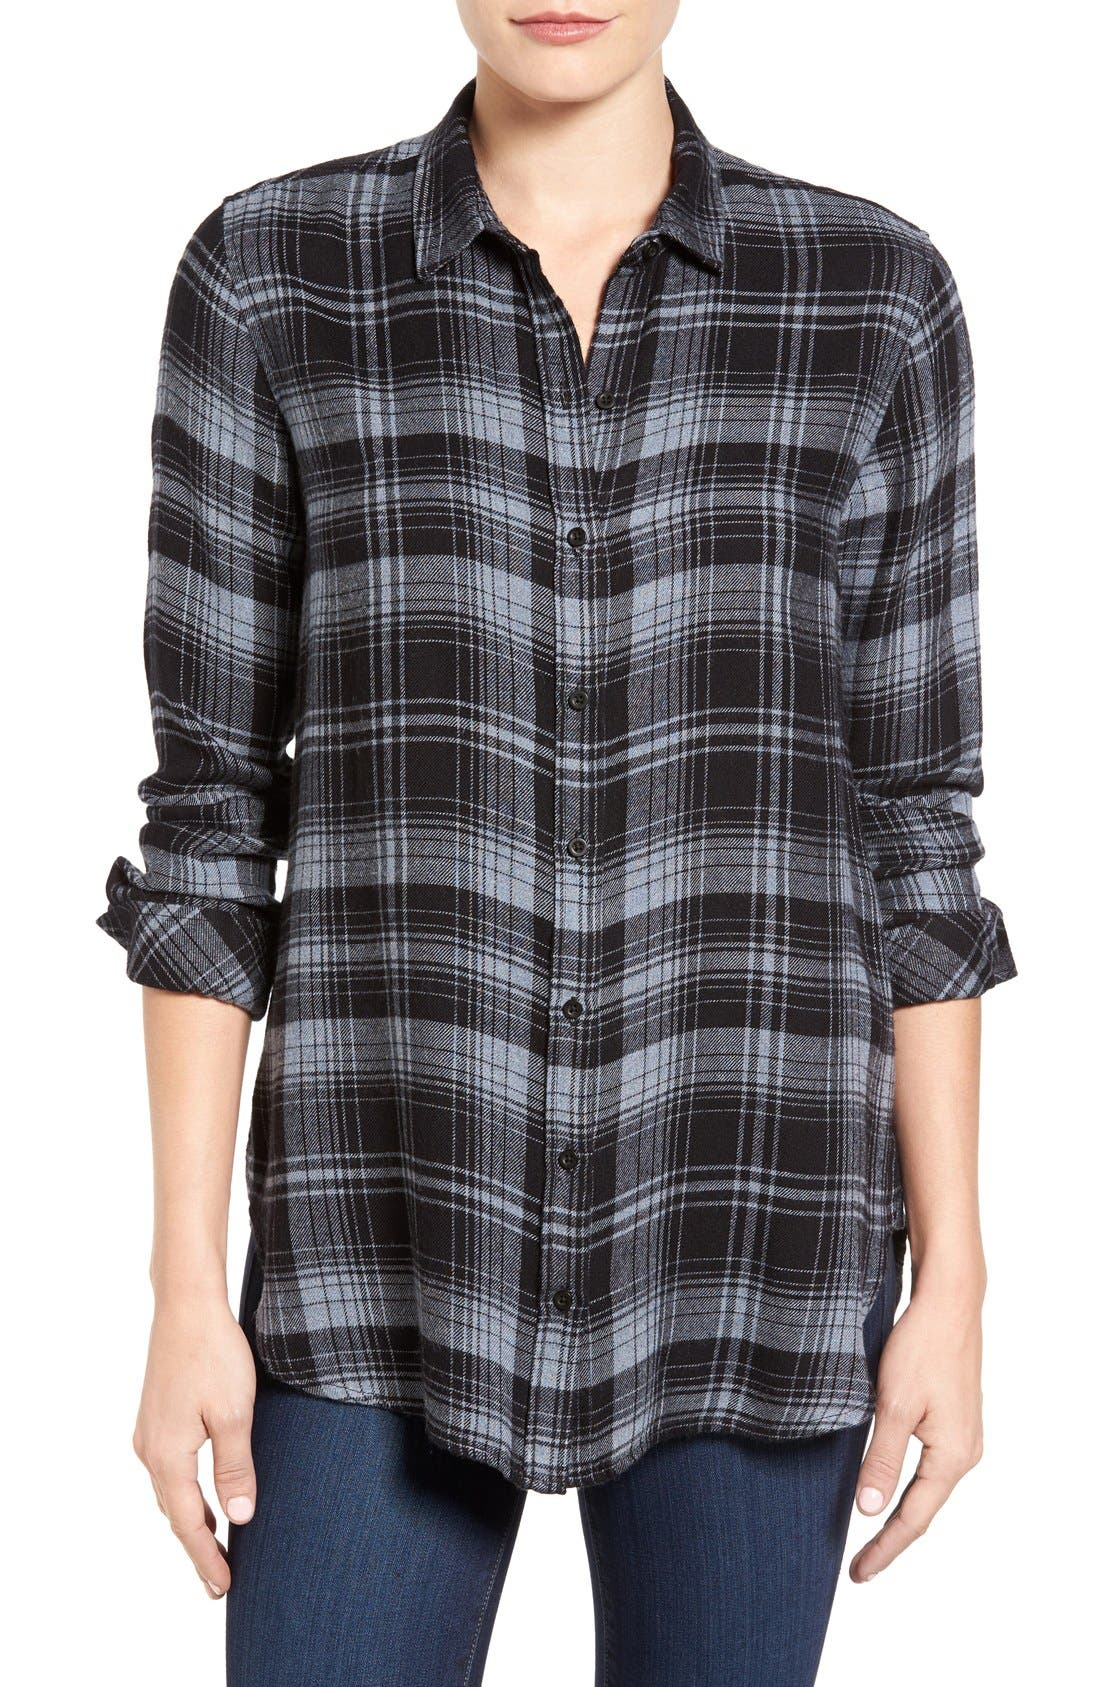 Alternate Image 1 Selected - Side Stitch Plaid Shirt